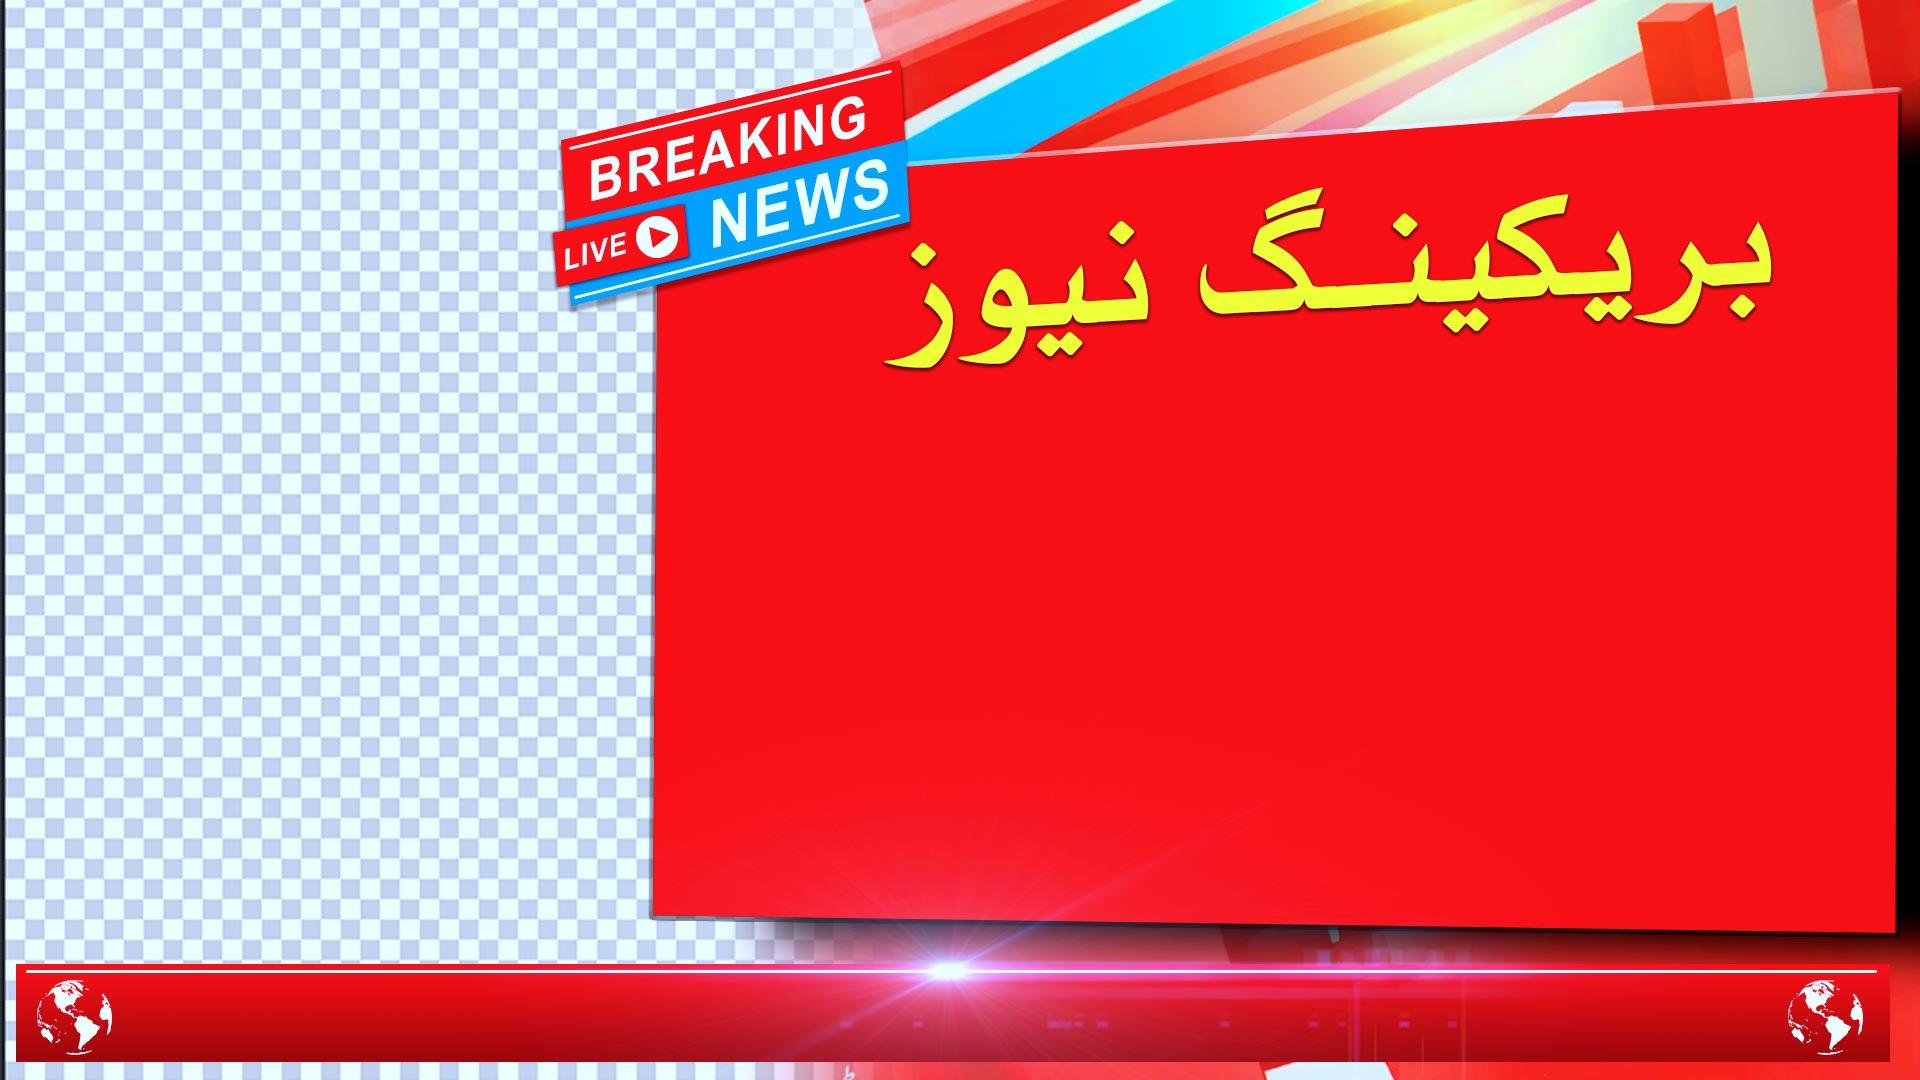 Download Breaking News Free PNG Transparent Image | MTC TUTORIALS